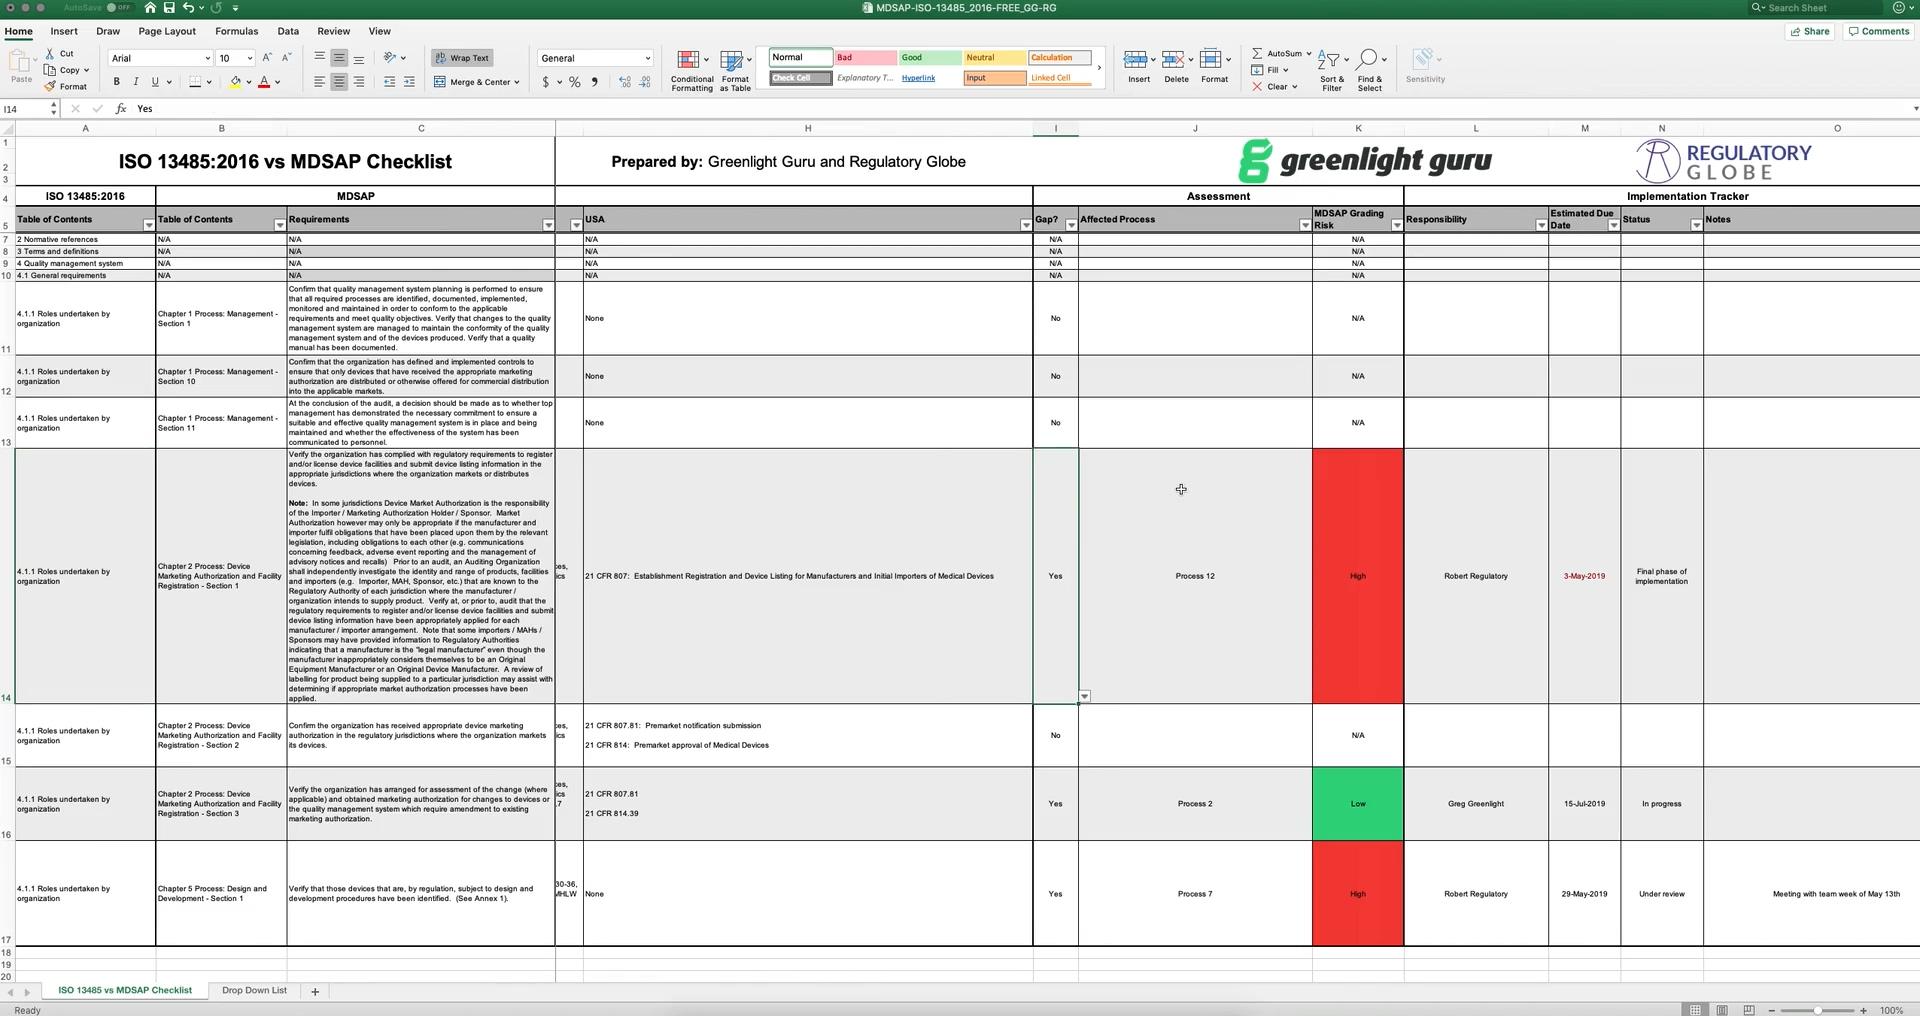 MDSAP vs. ISO 13485_2016 Gap Assessment Tool